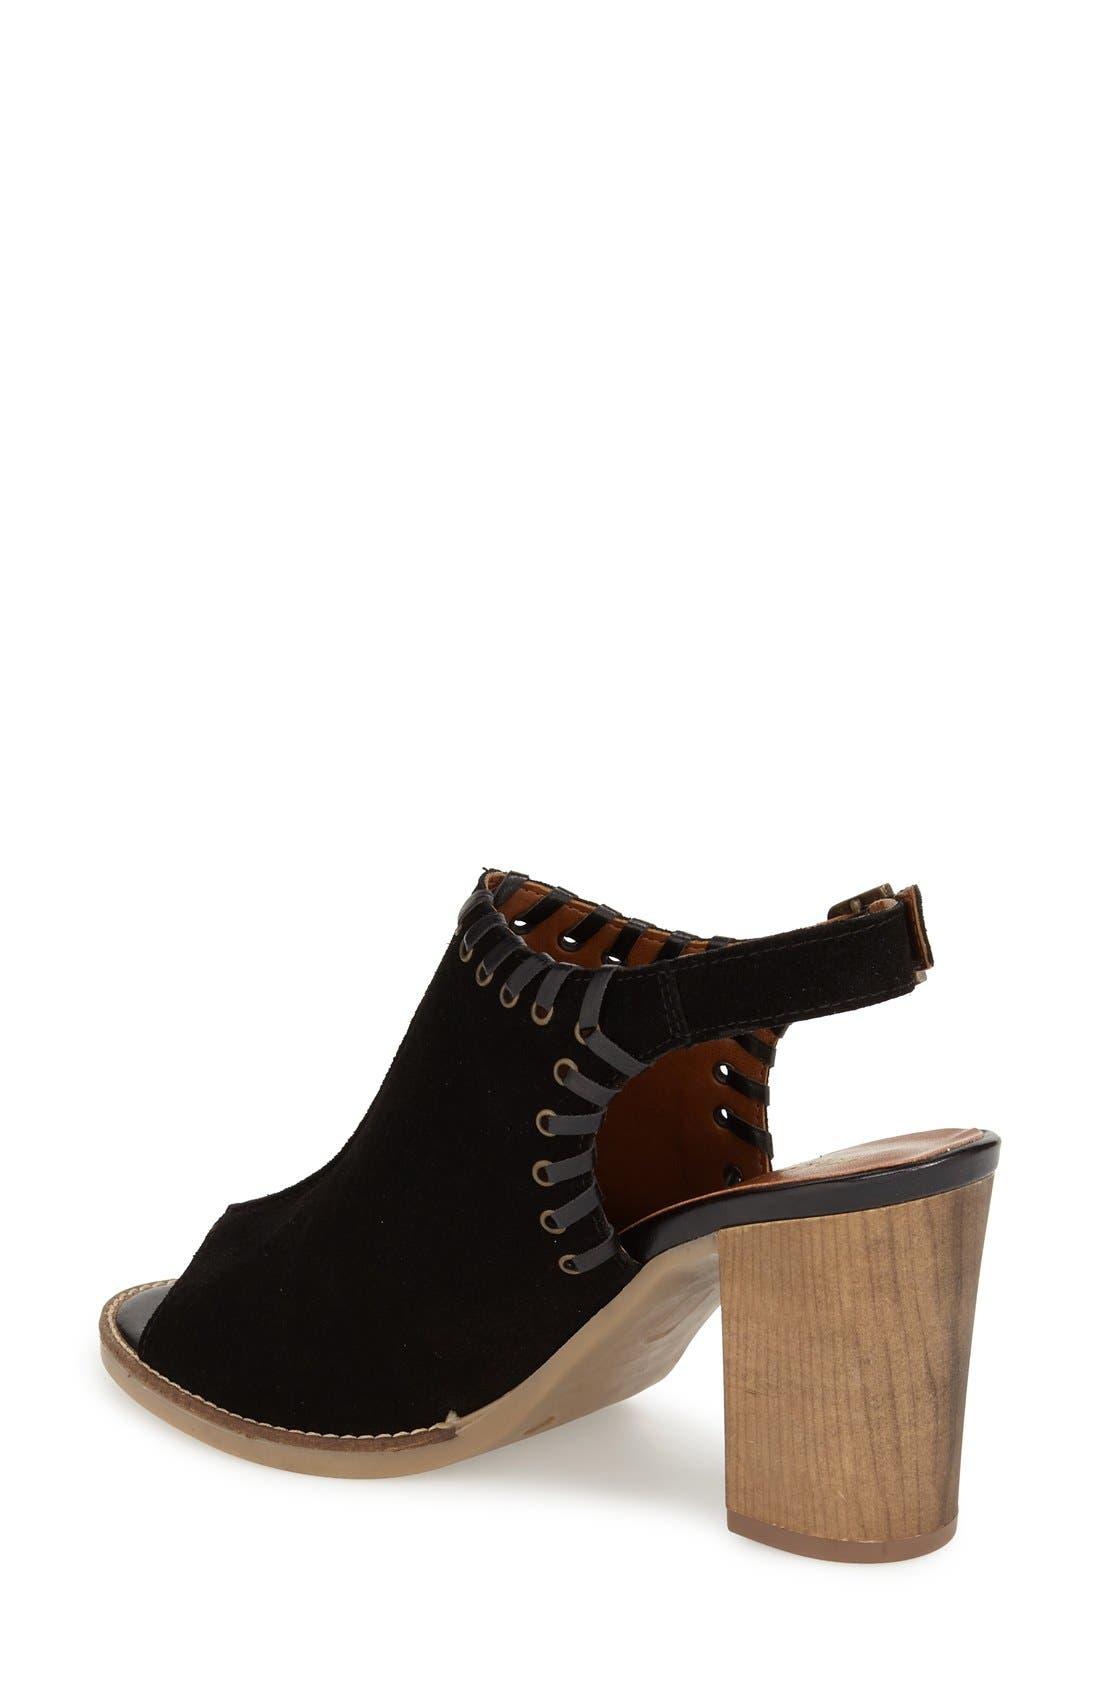 'Ora' Block Heel Slingback Sandal,                             Alternate thumbnail 2, color,                             018